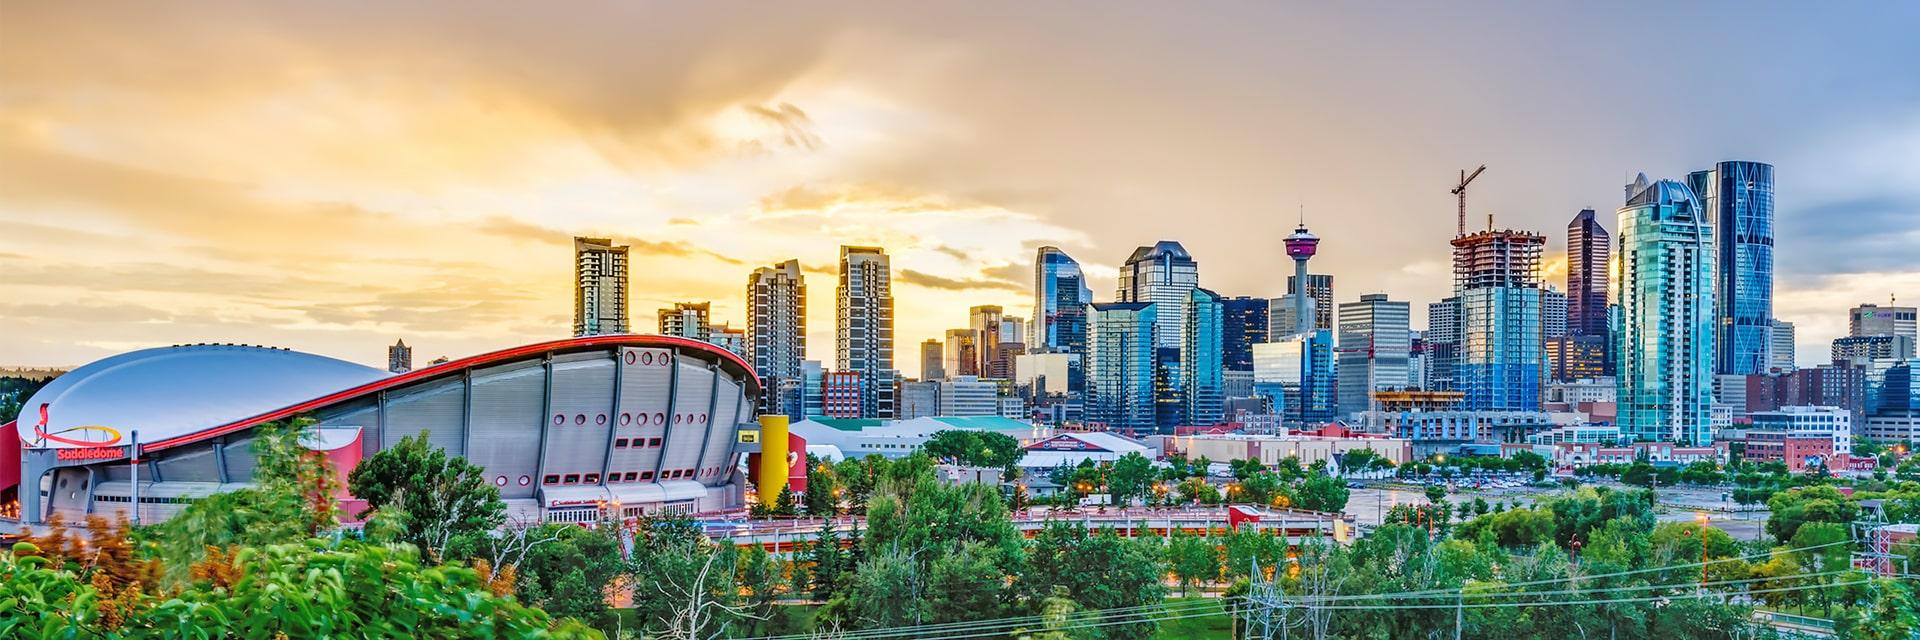 Escuela de inglés en Calgary | Global Village Calgary